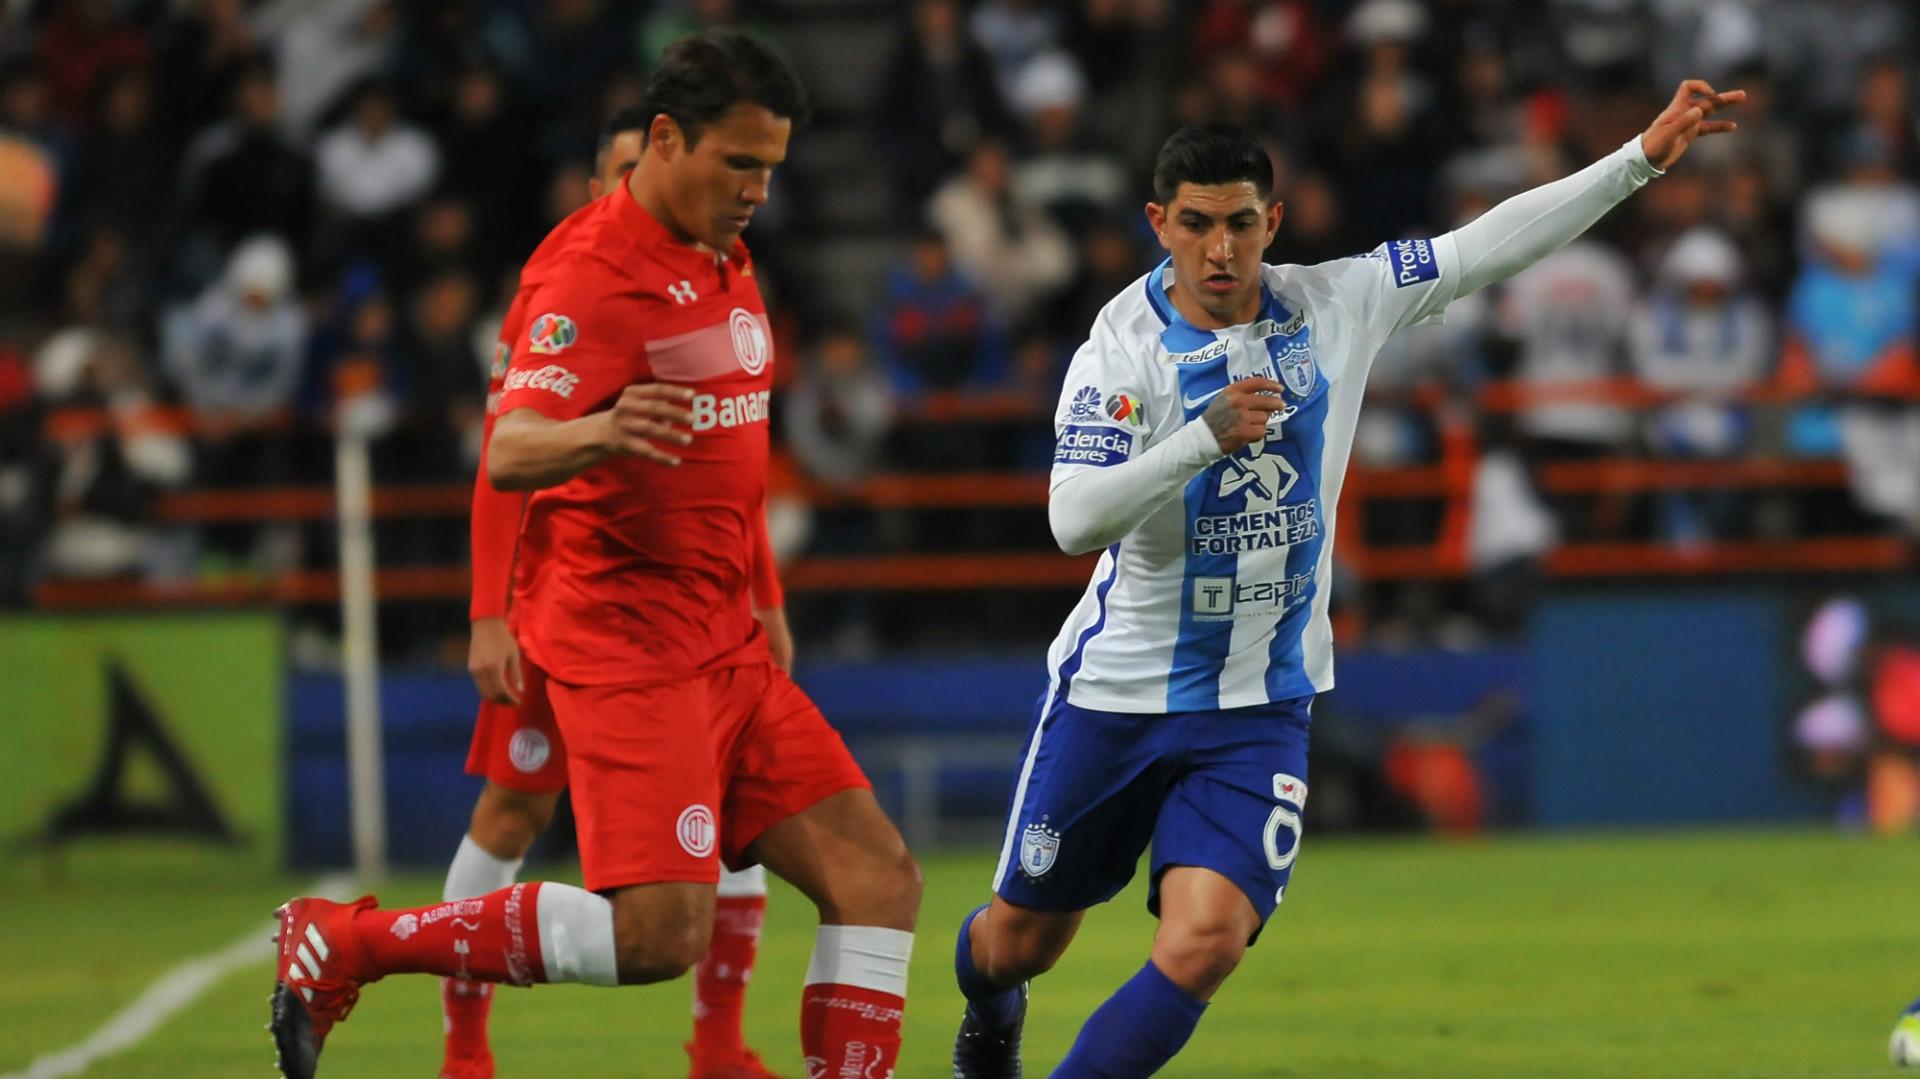 Aaron Galindo Toluca